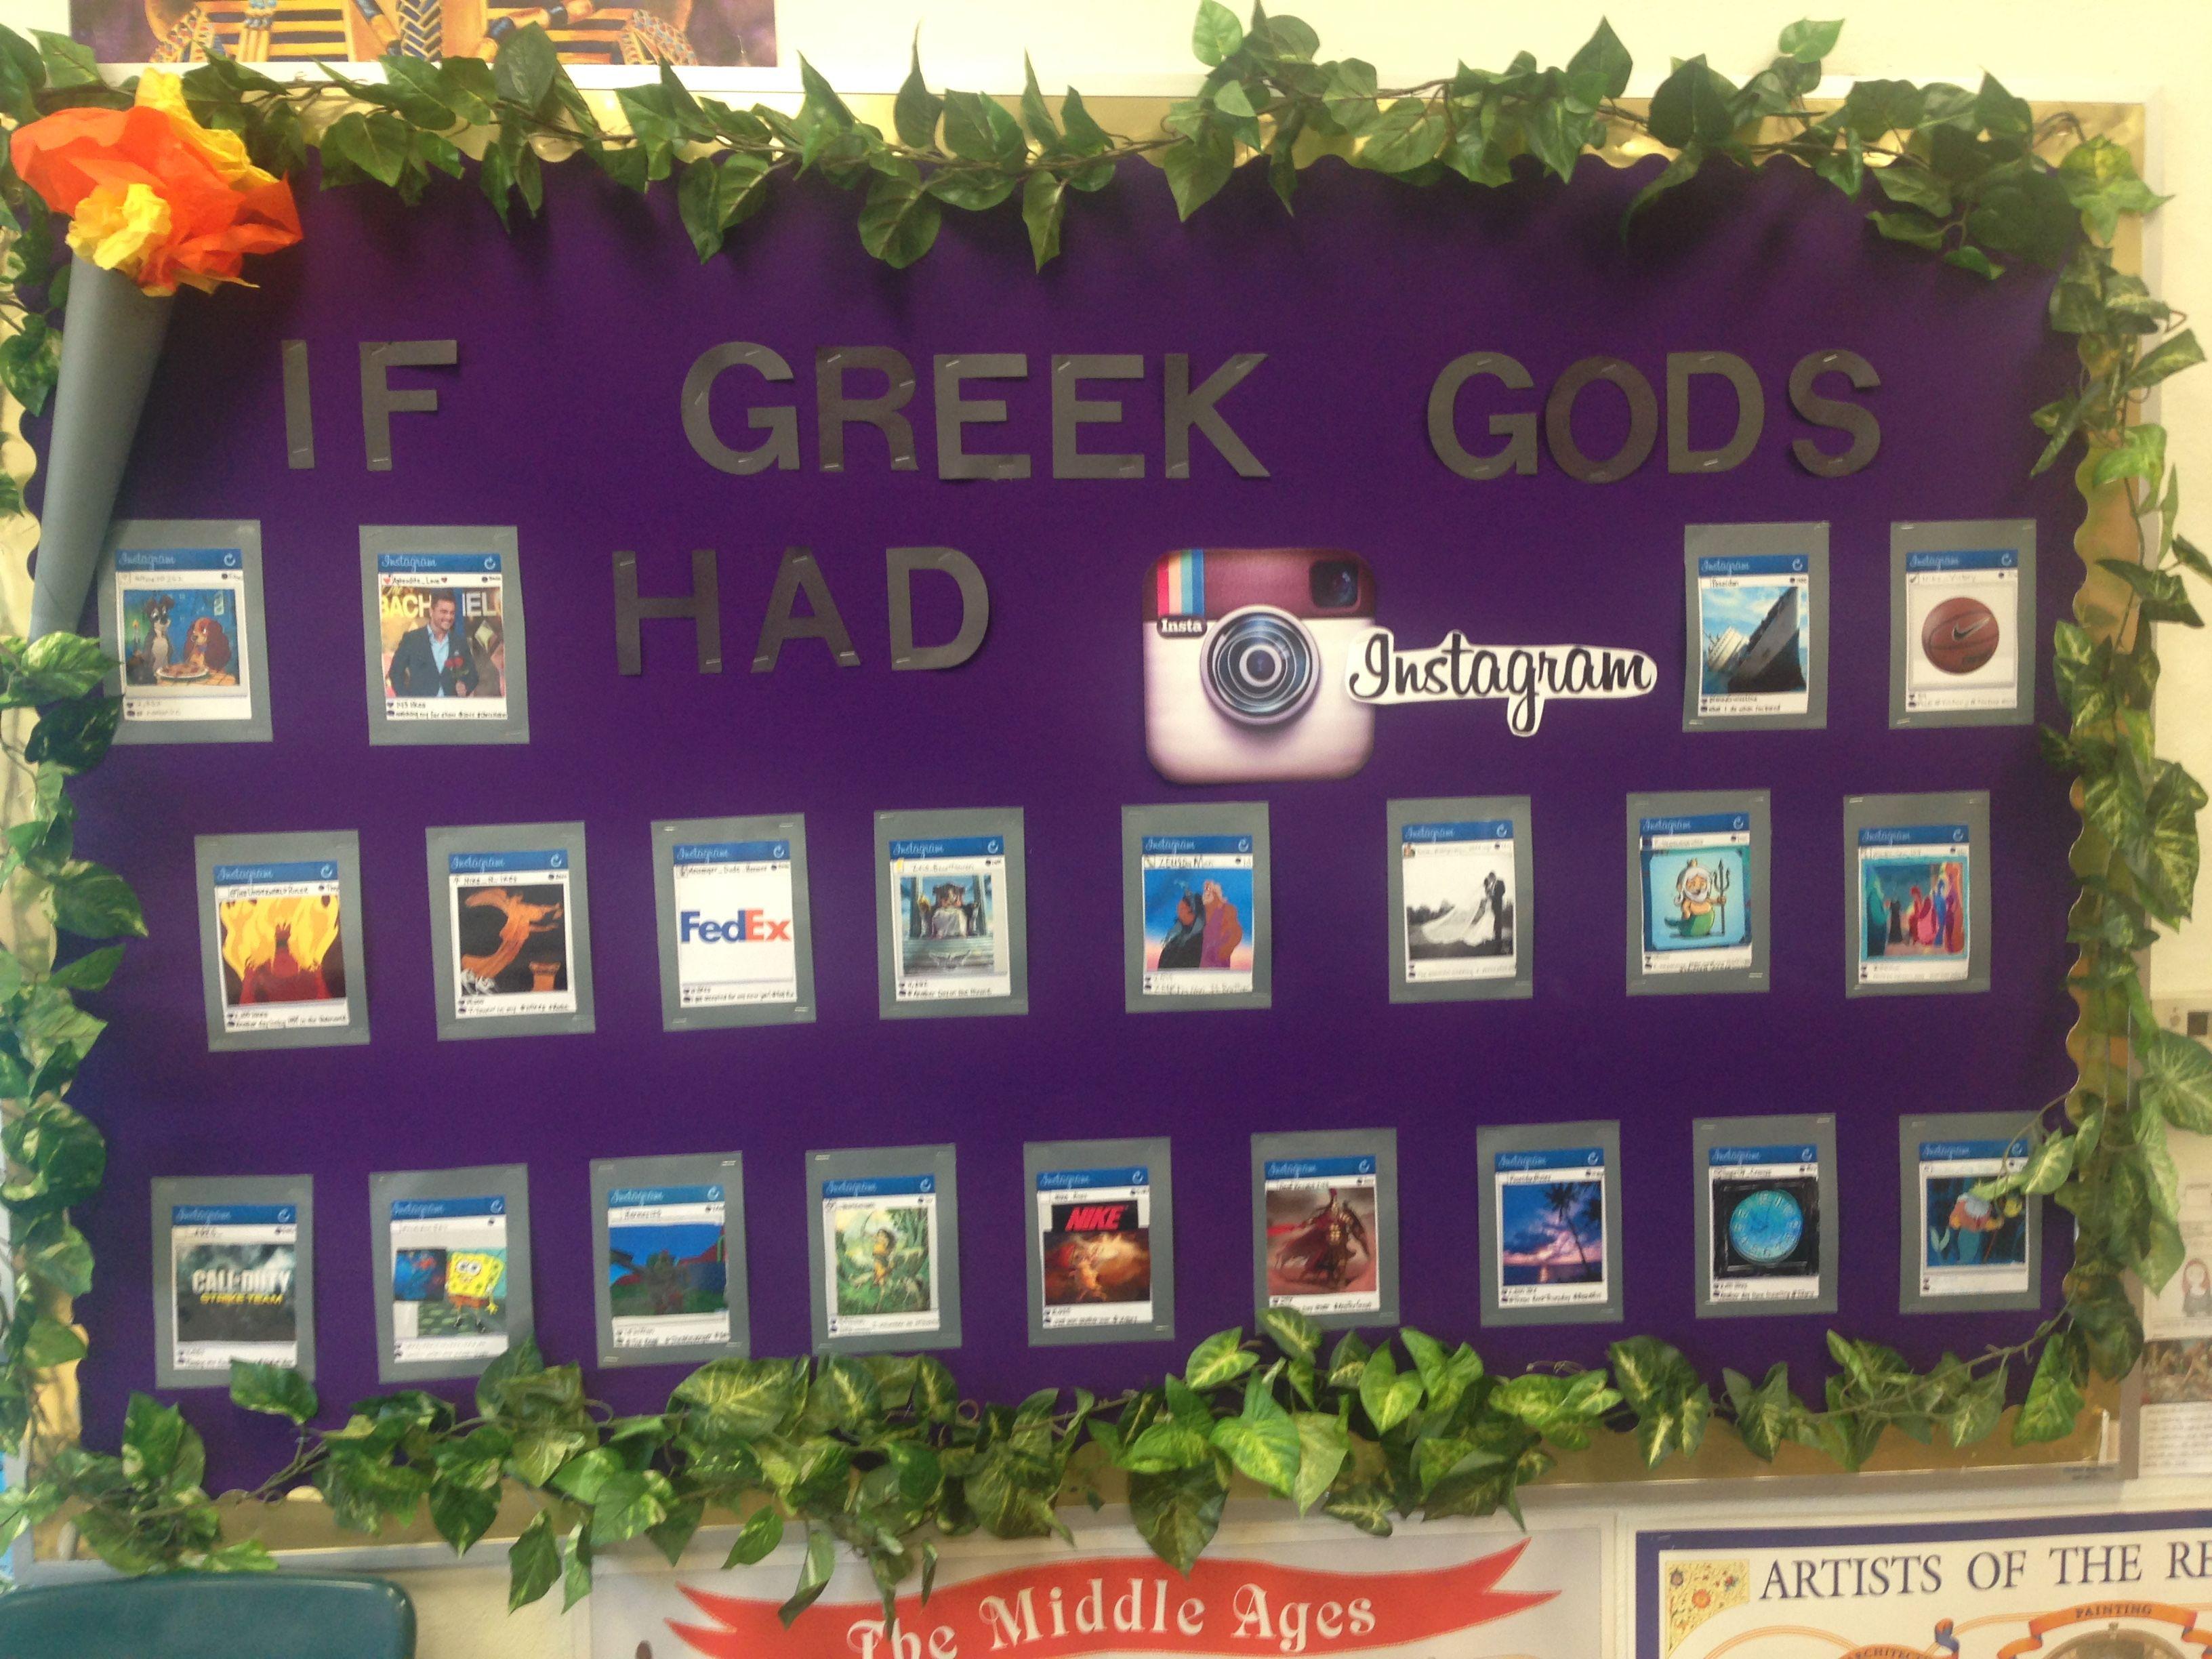 If Greek gods had Inatagram  6th grade history Greek mythology activity